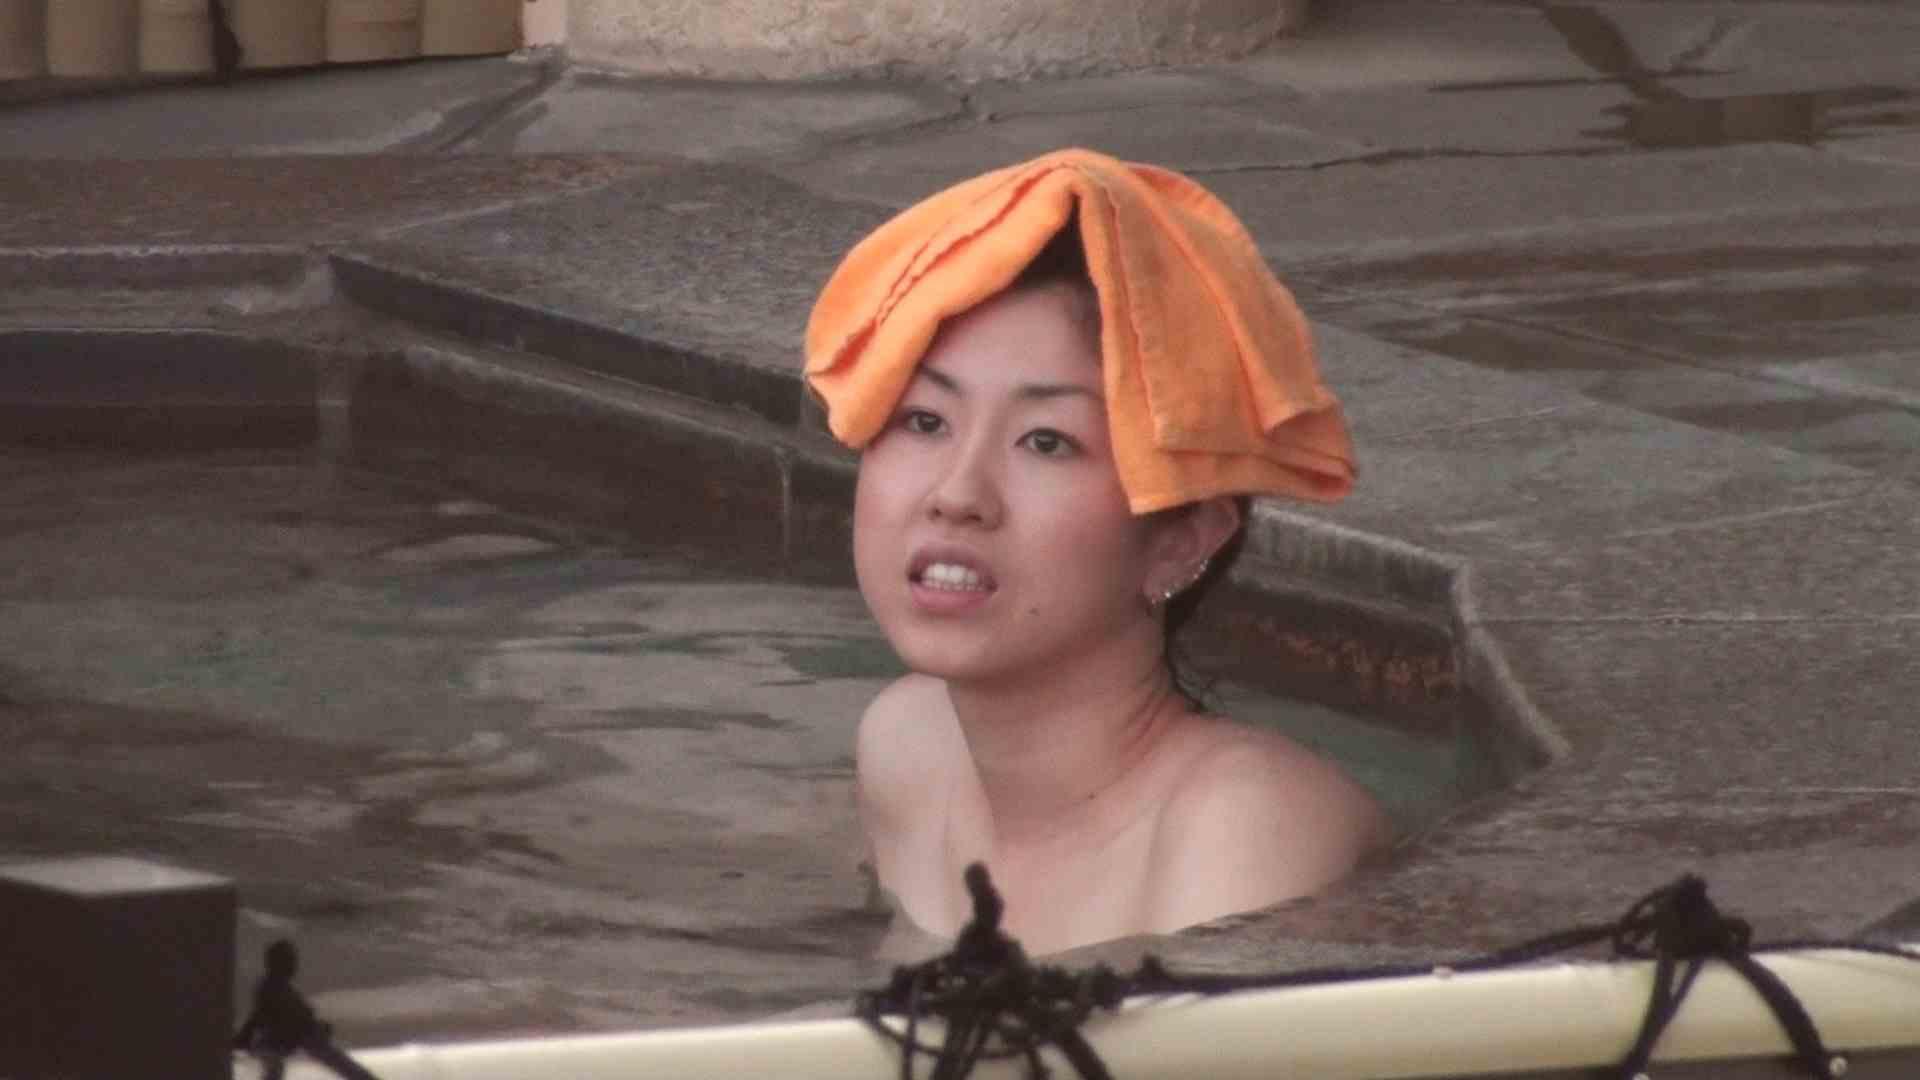 Aquaな露天風呂Vol.135 盗撮師作品  105pic 33